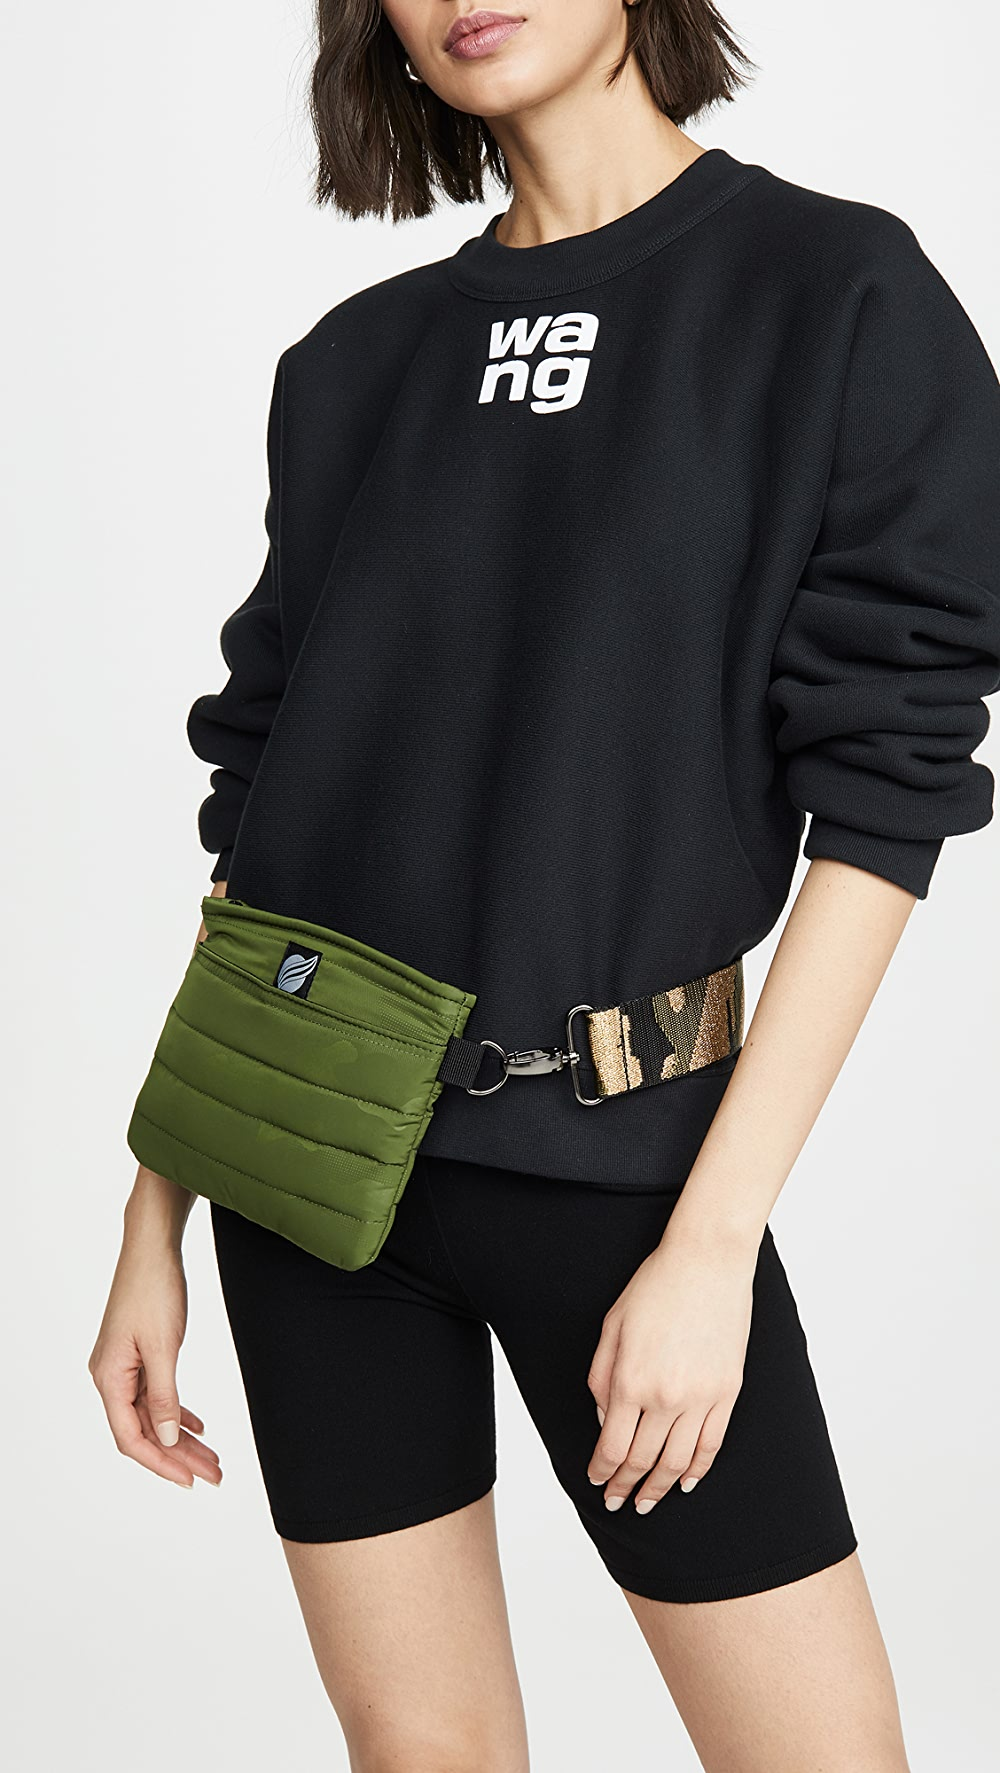 Adaptable Think Royln - Convertible Belt Crossbody Bag Easy To Lubricate